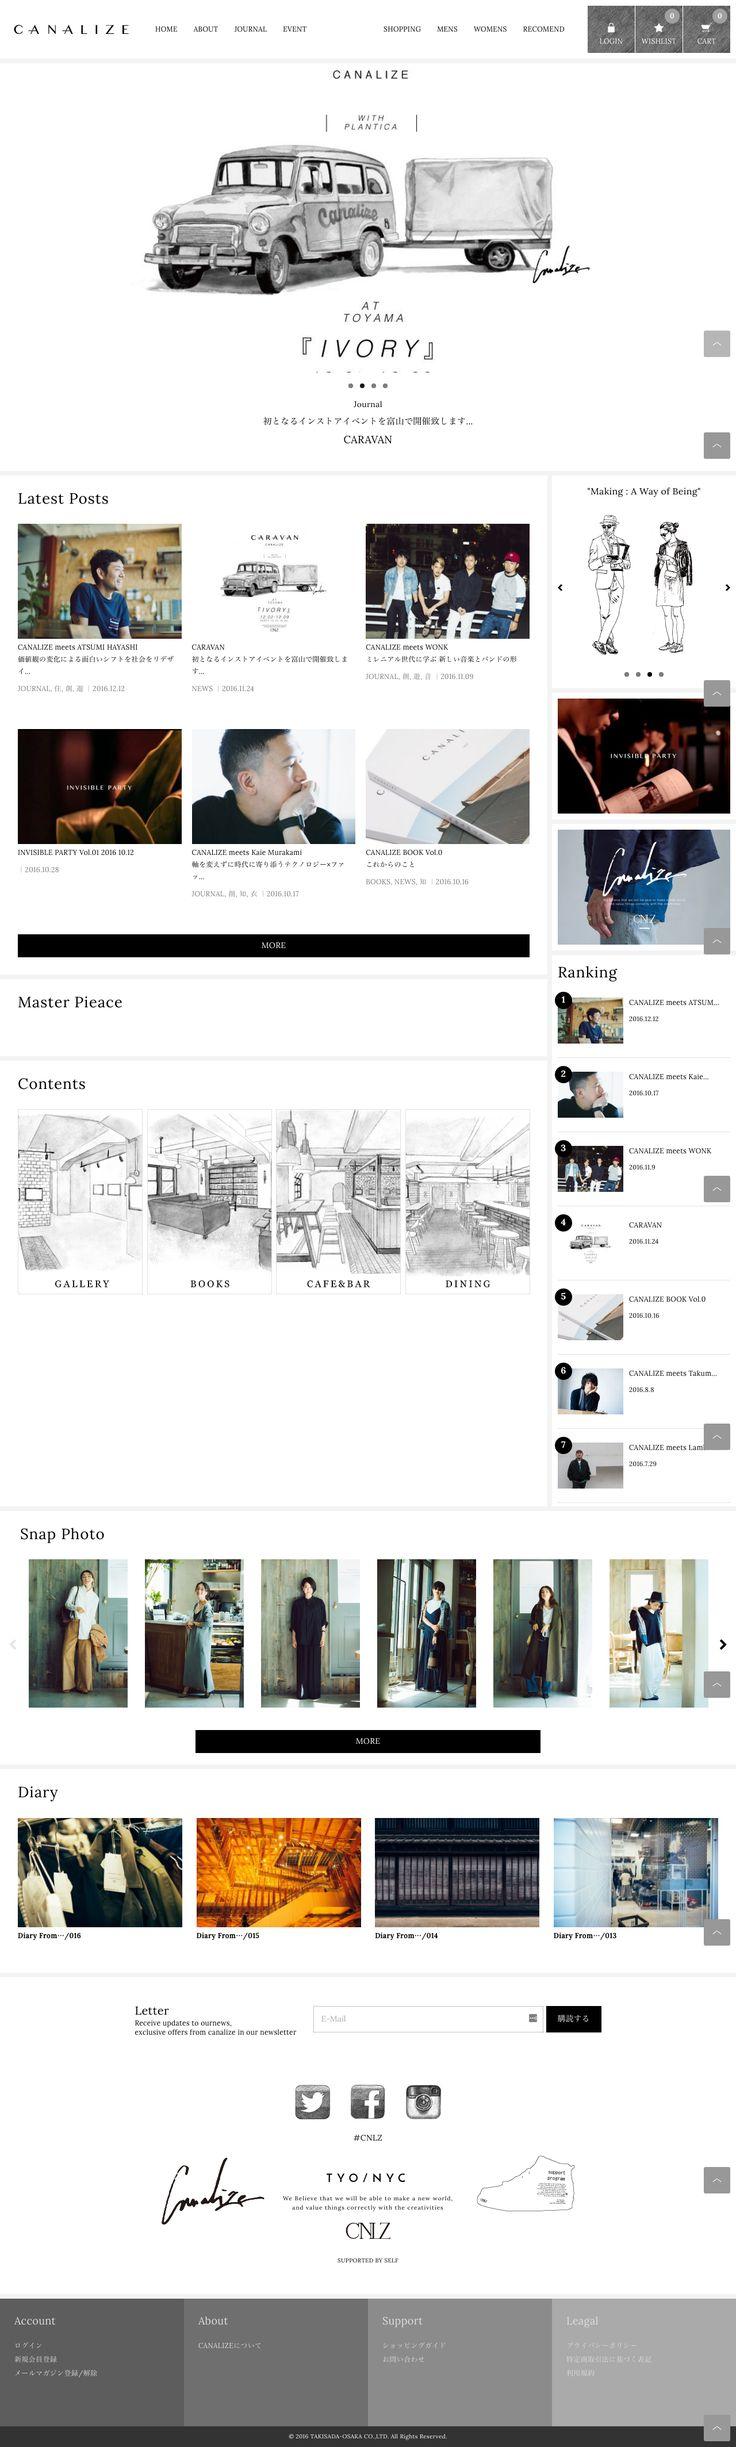 #shopping-store-web-design #portal #header-fix-layout #key-color-black #bg-color-white #Japanese #Flat-design #Slider #Handwritten